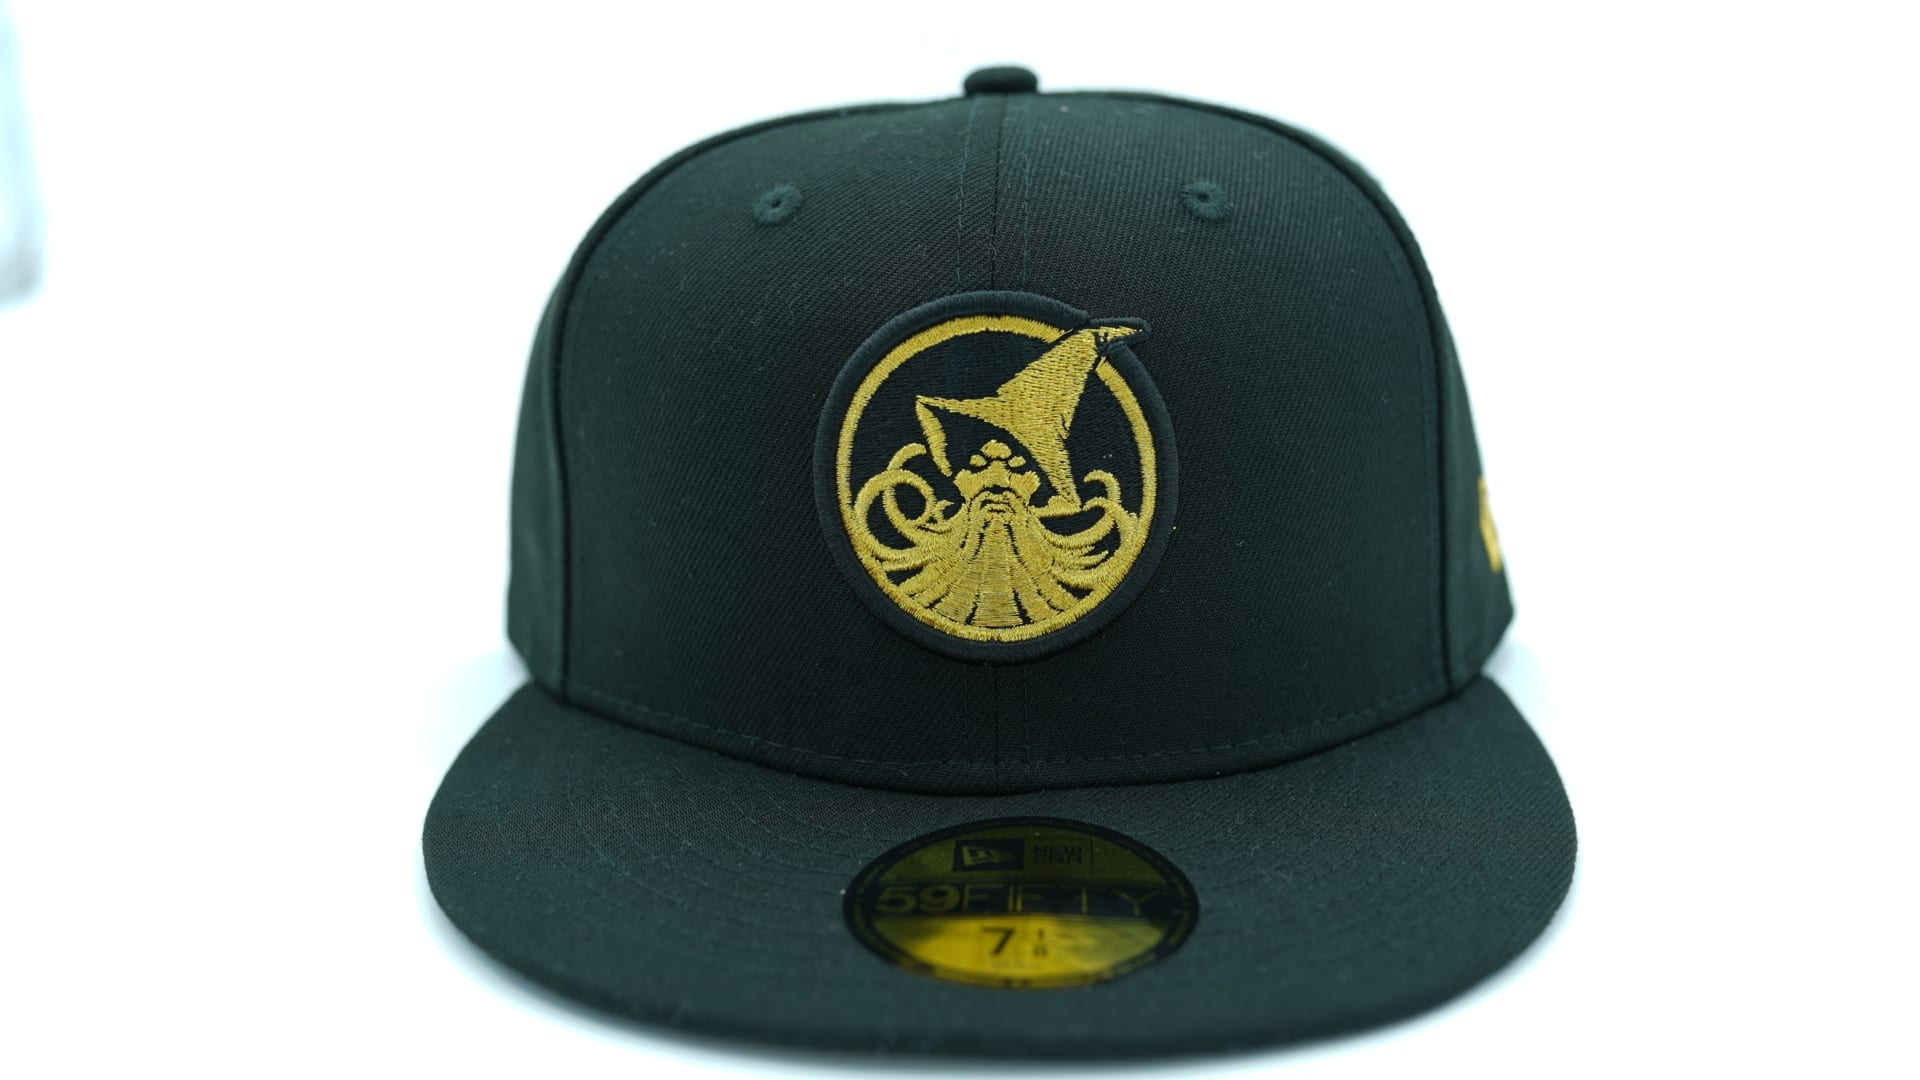 NBA Logo Camo Visor 59Fifty Fitted Baseball Cap by NEW ERA x NBA ... a5e5f76b55b